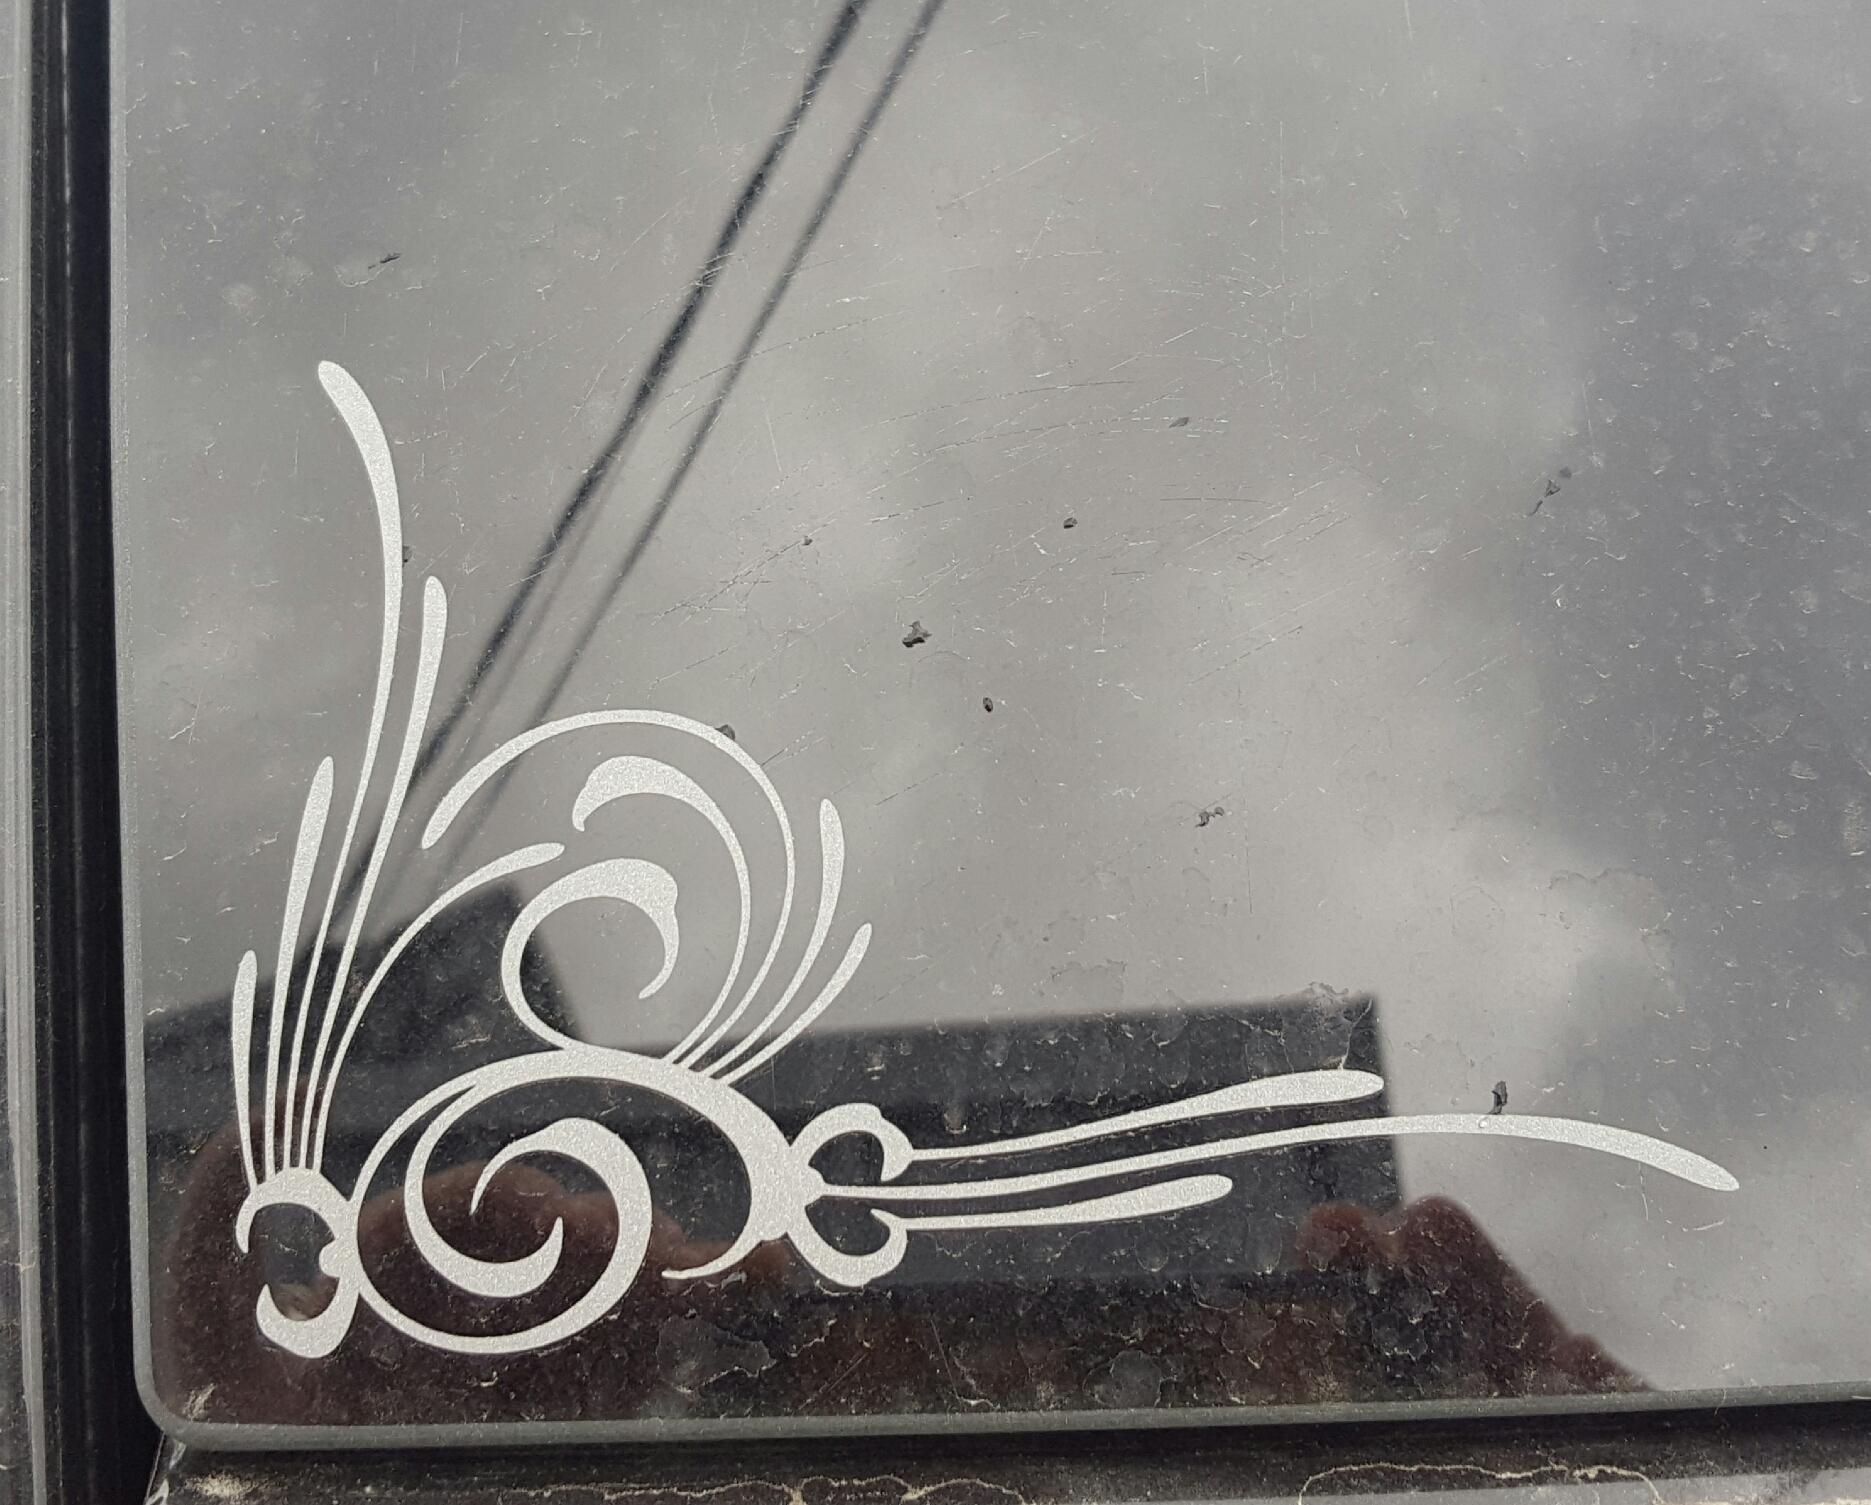 Amy's photograph of their Swirly Decorative Corner Sticker